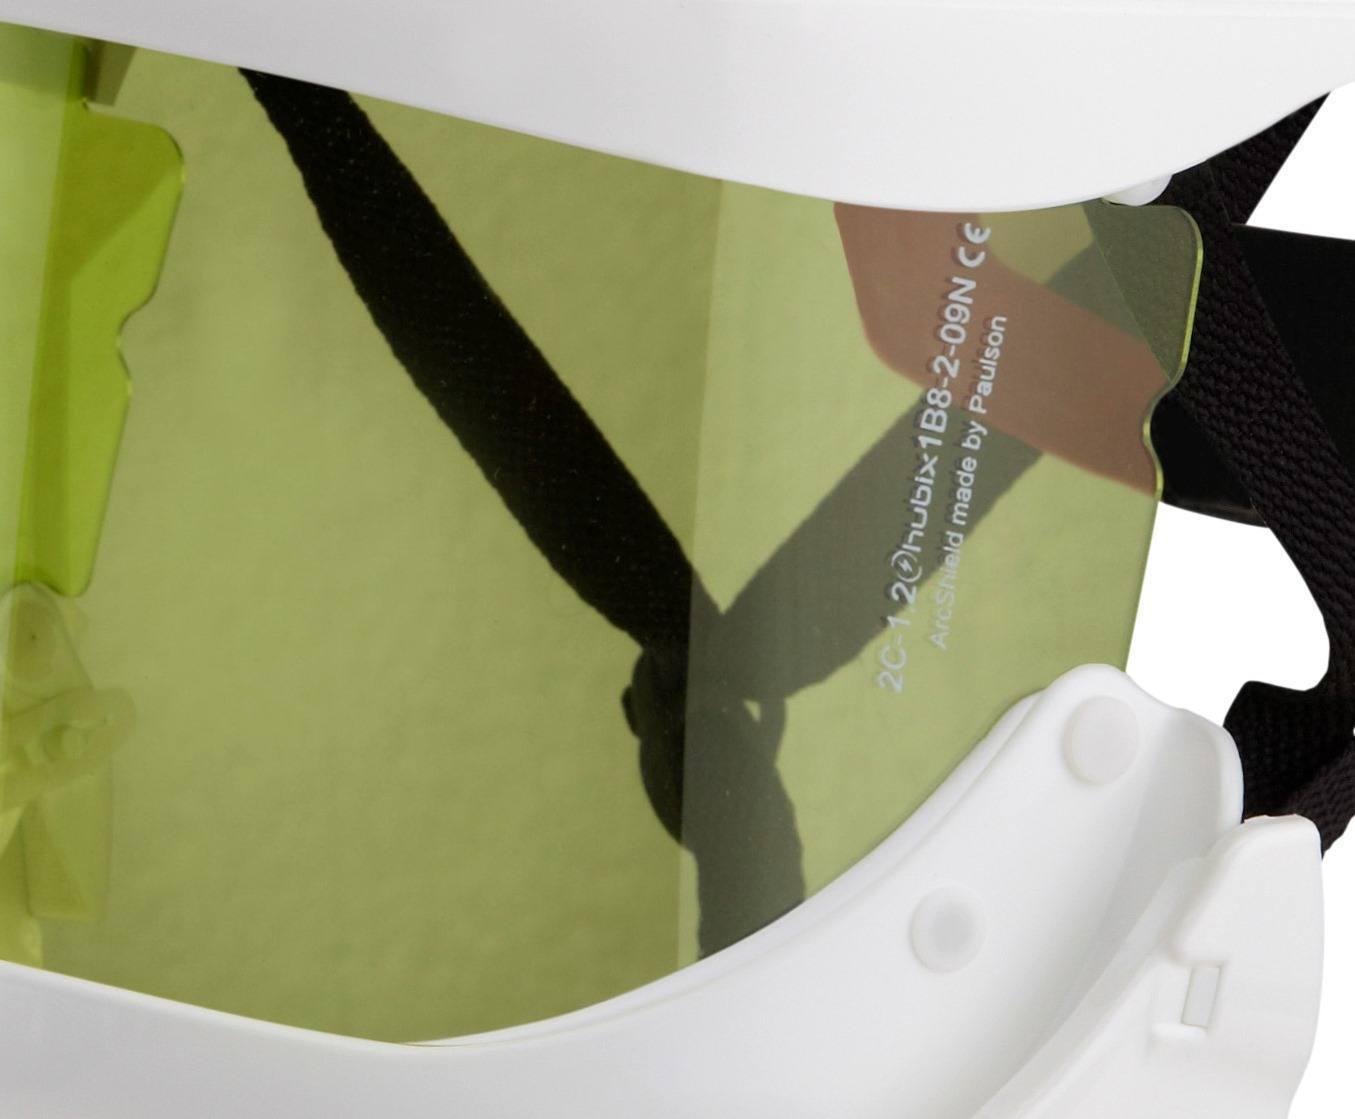 ProGARM 2688 Arc Flash Safety Helmet 8.4 cal rating Class 2-1292